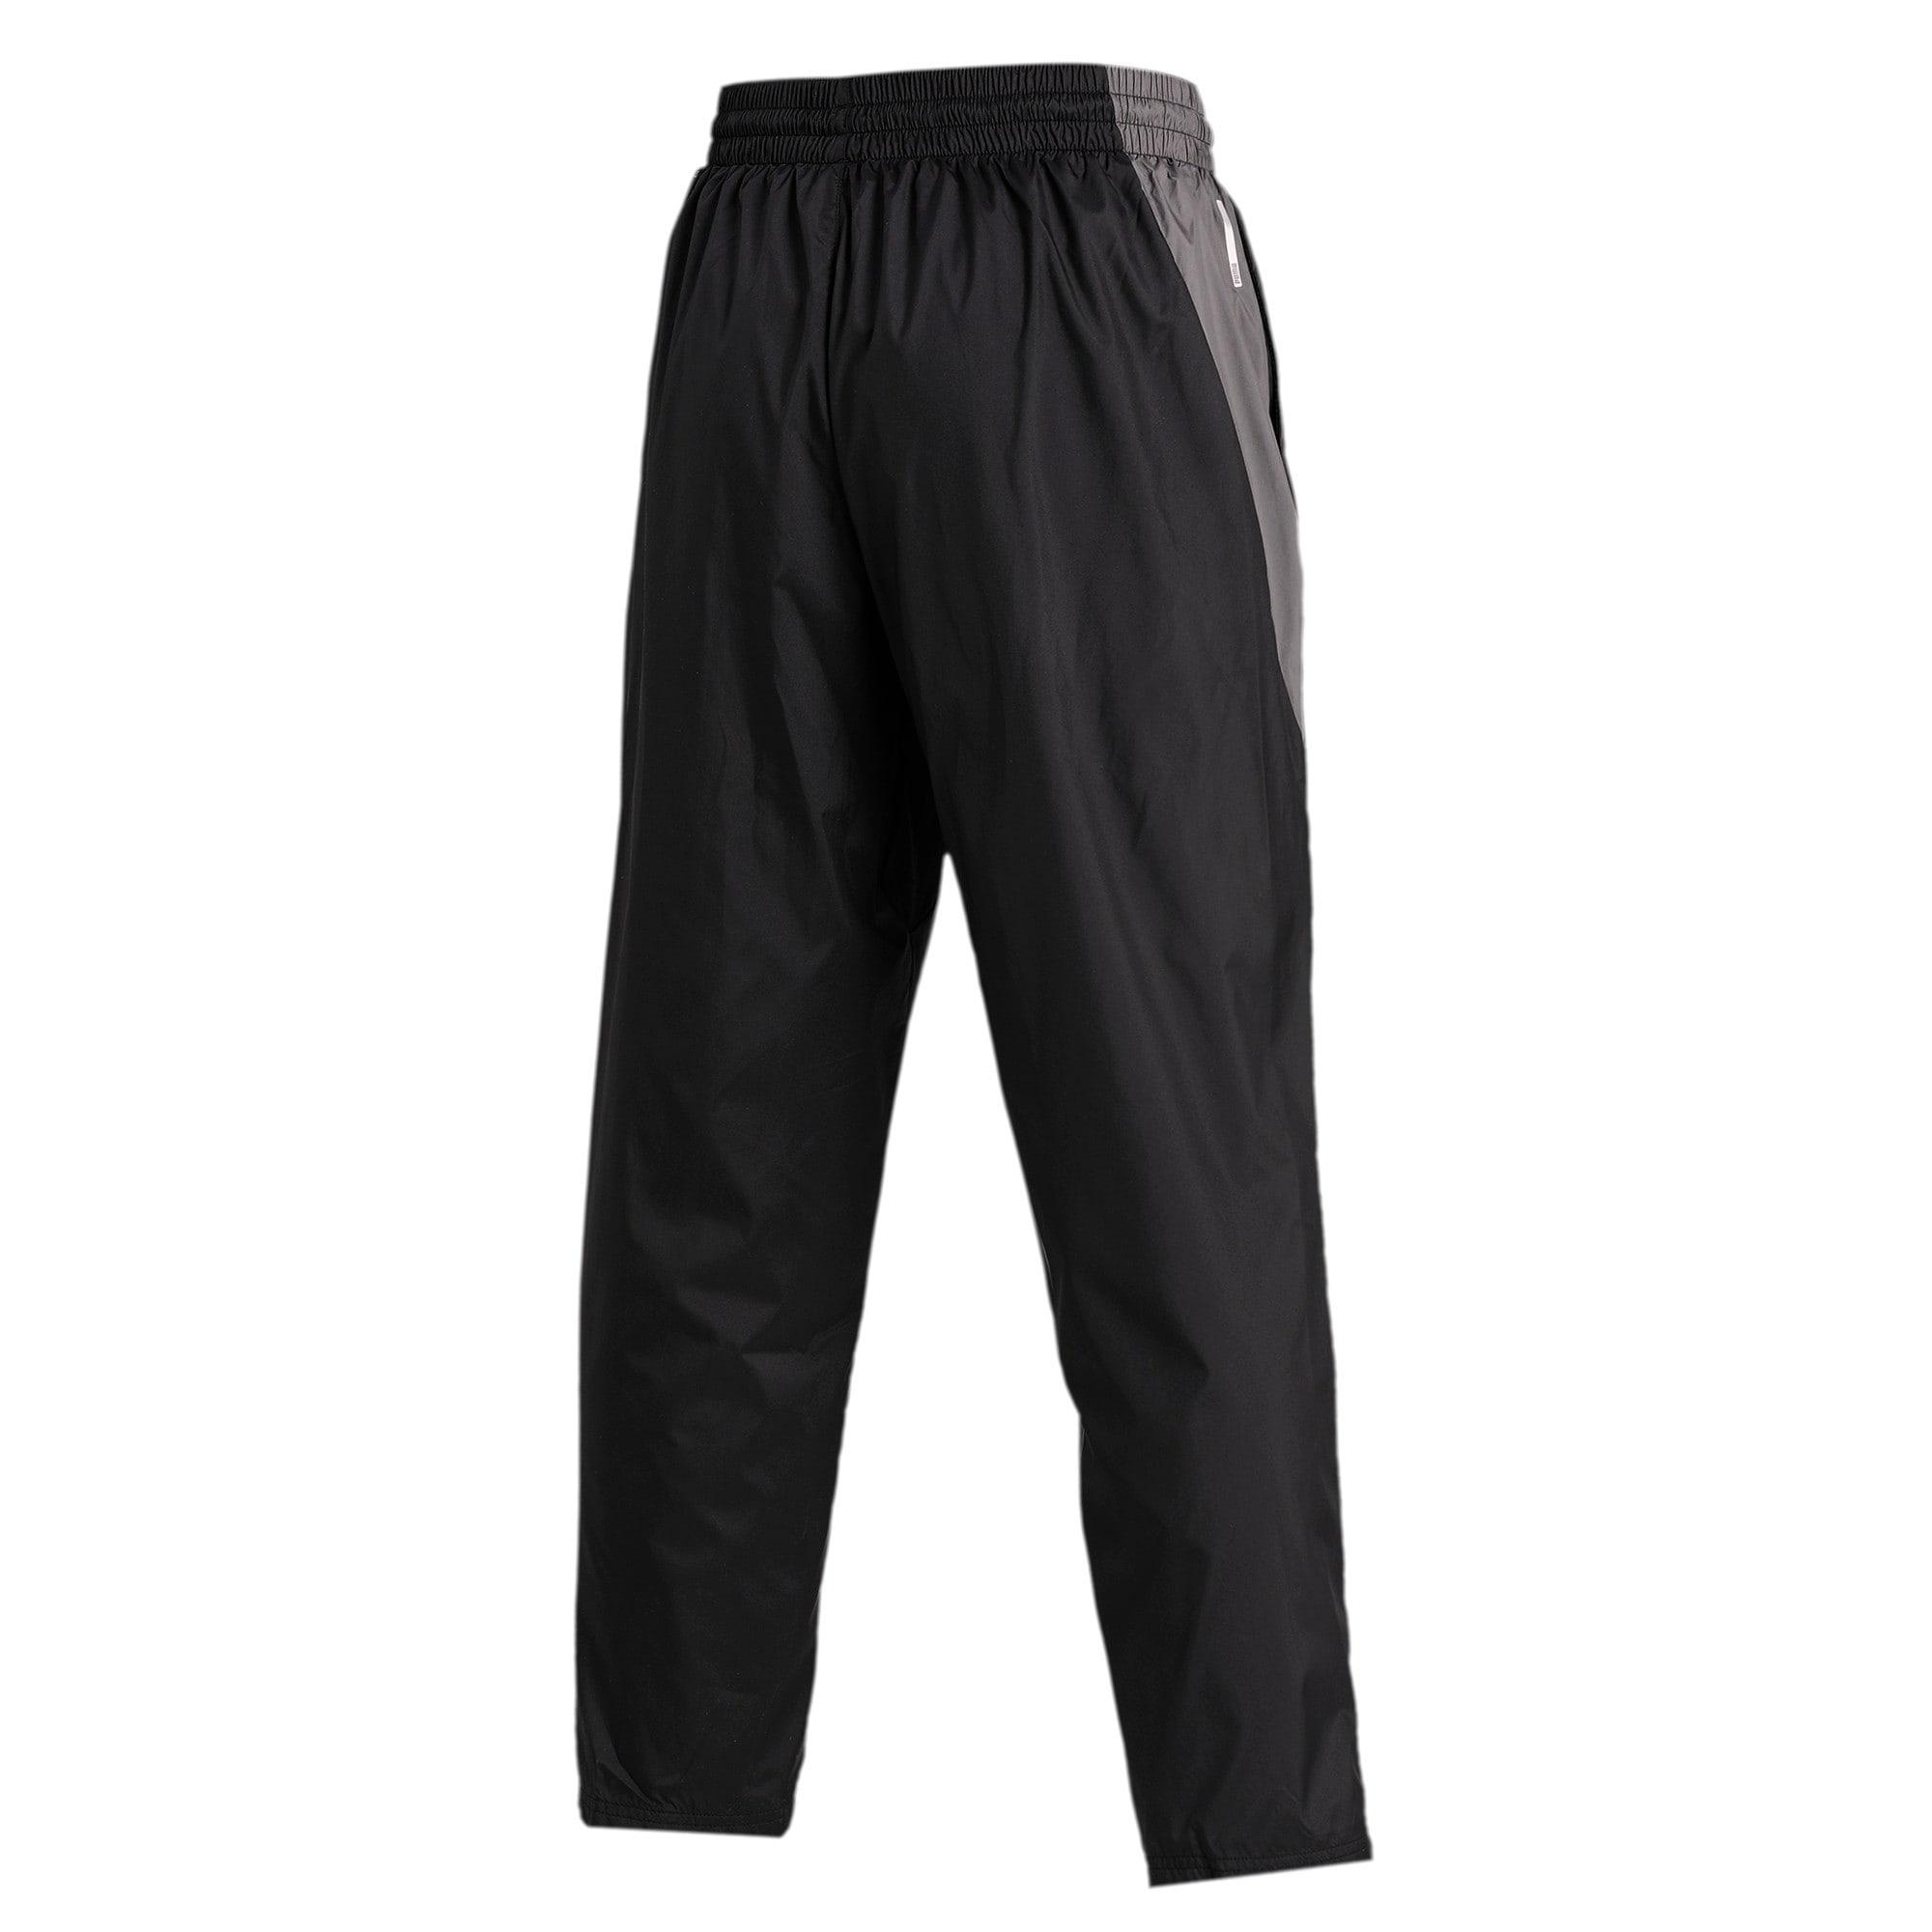 Thumbnail 5 of Reactive Woven Men's Training Pants, Puma Black-CASTLEROCK, medium-IND